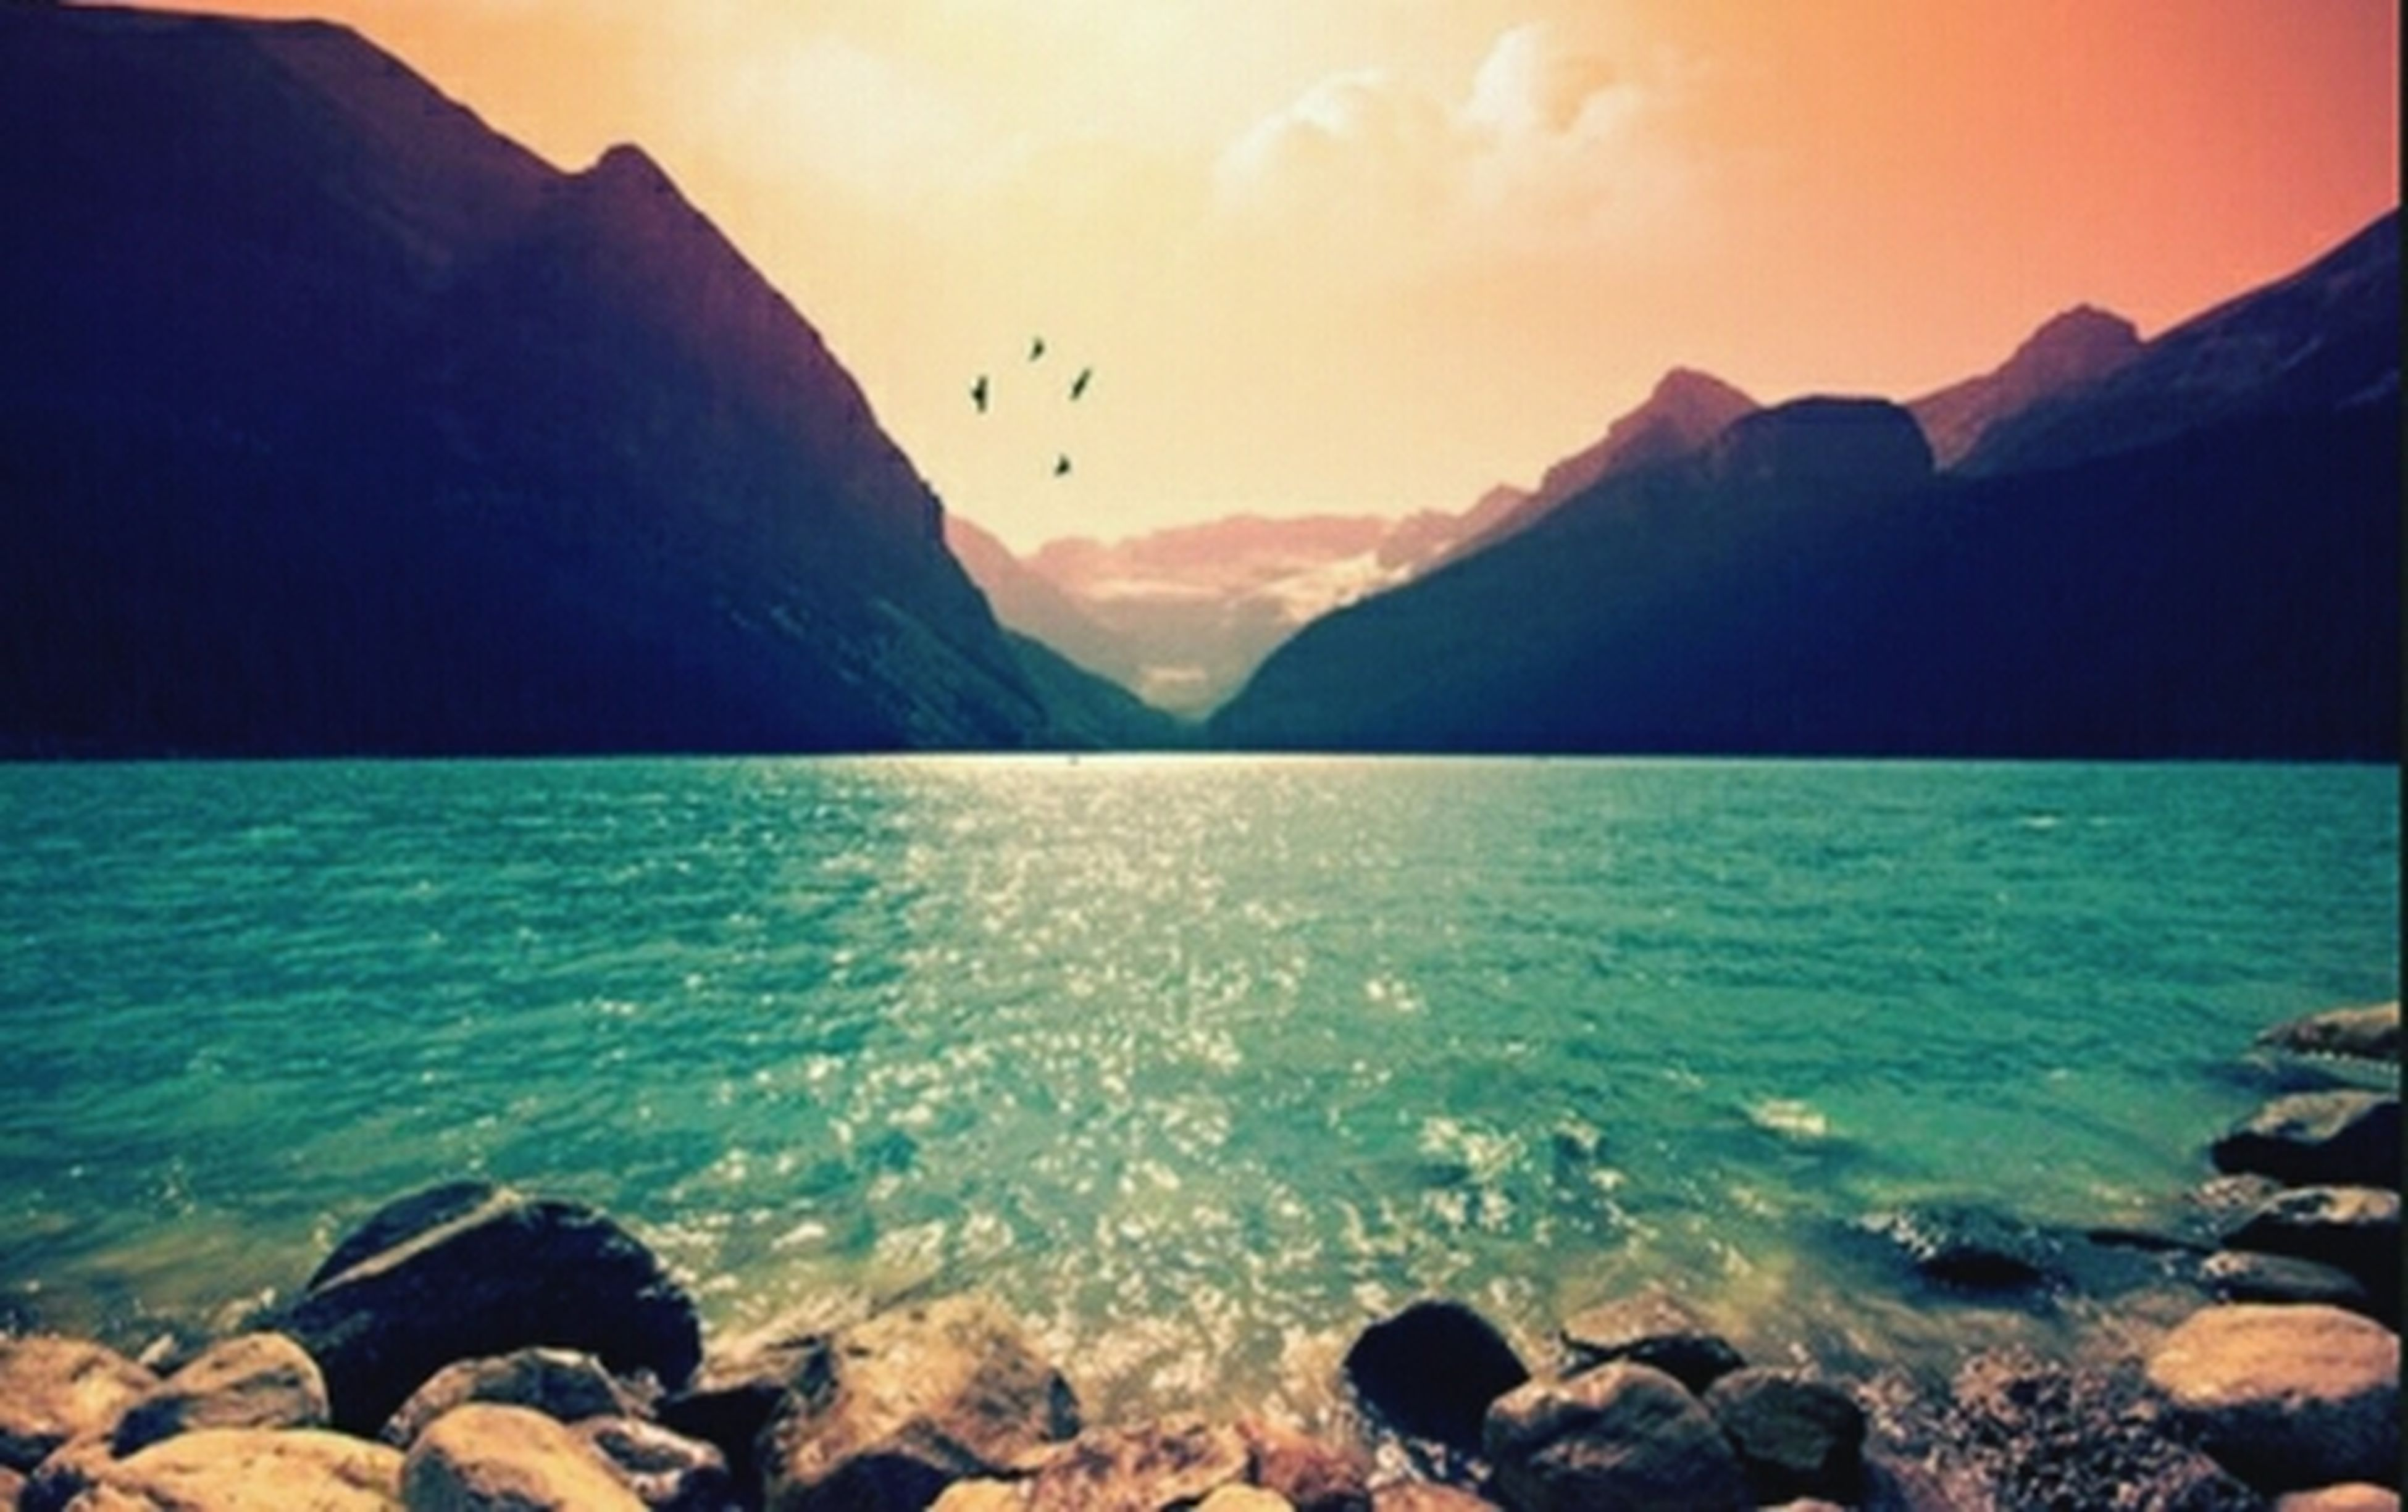 water, sea, mountain, scenics, tranquil scene, beauty in nature, tranquility, rock - object, sky, nature, idyllic, mountain range, rock, rock formation, shore, bird, silhouette, sunset, non-urban scene, outdoors